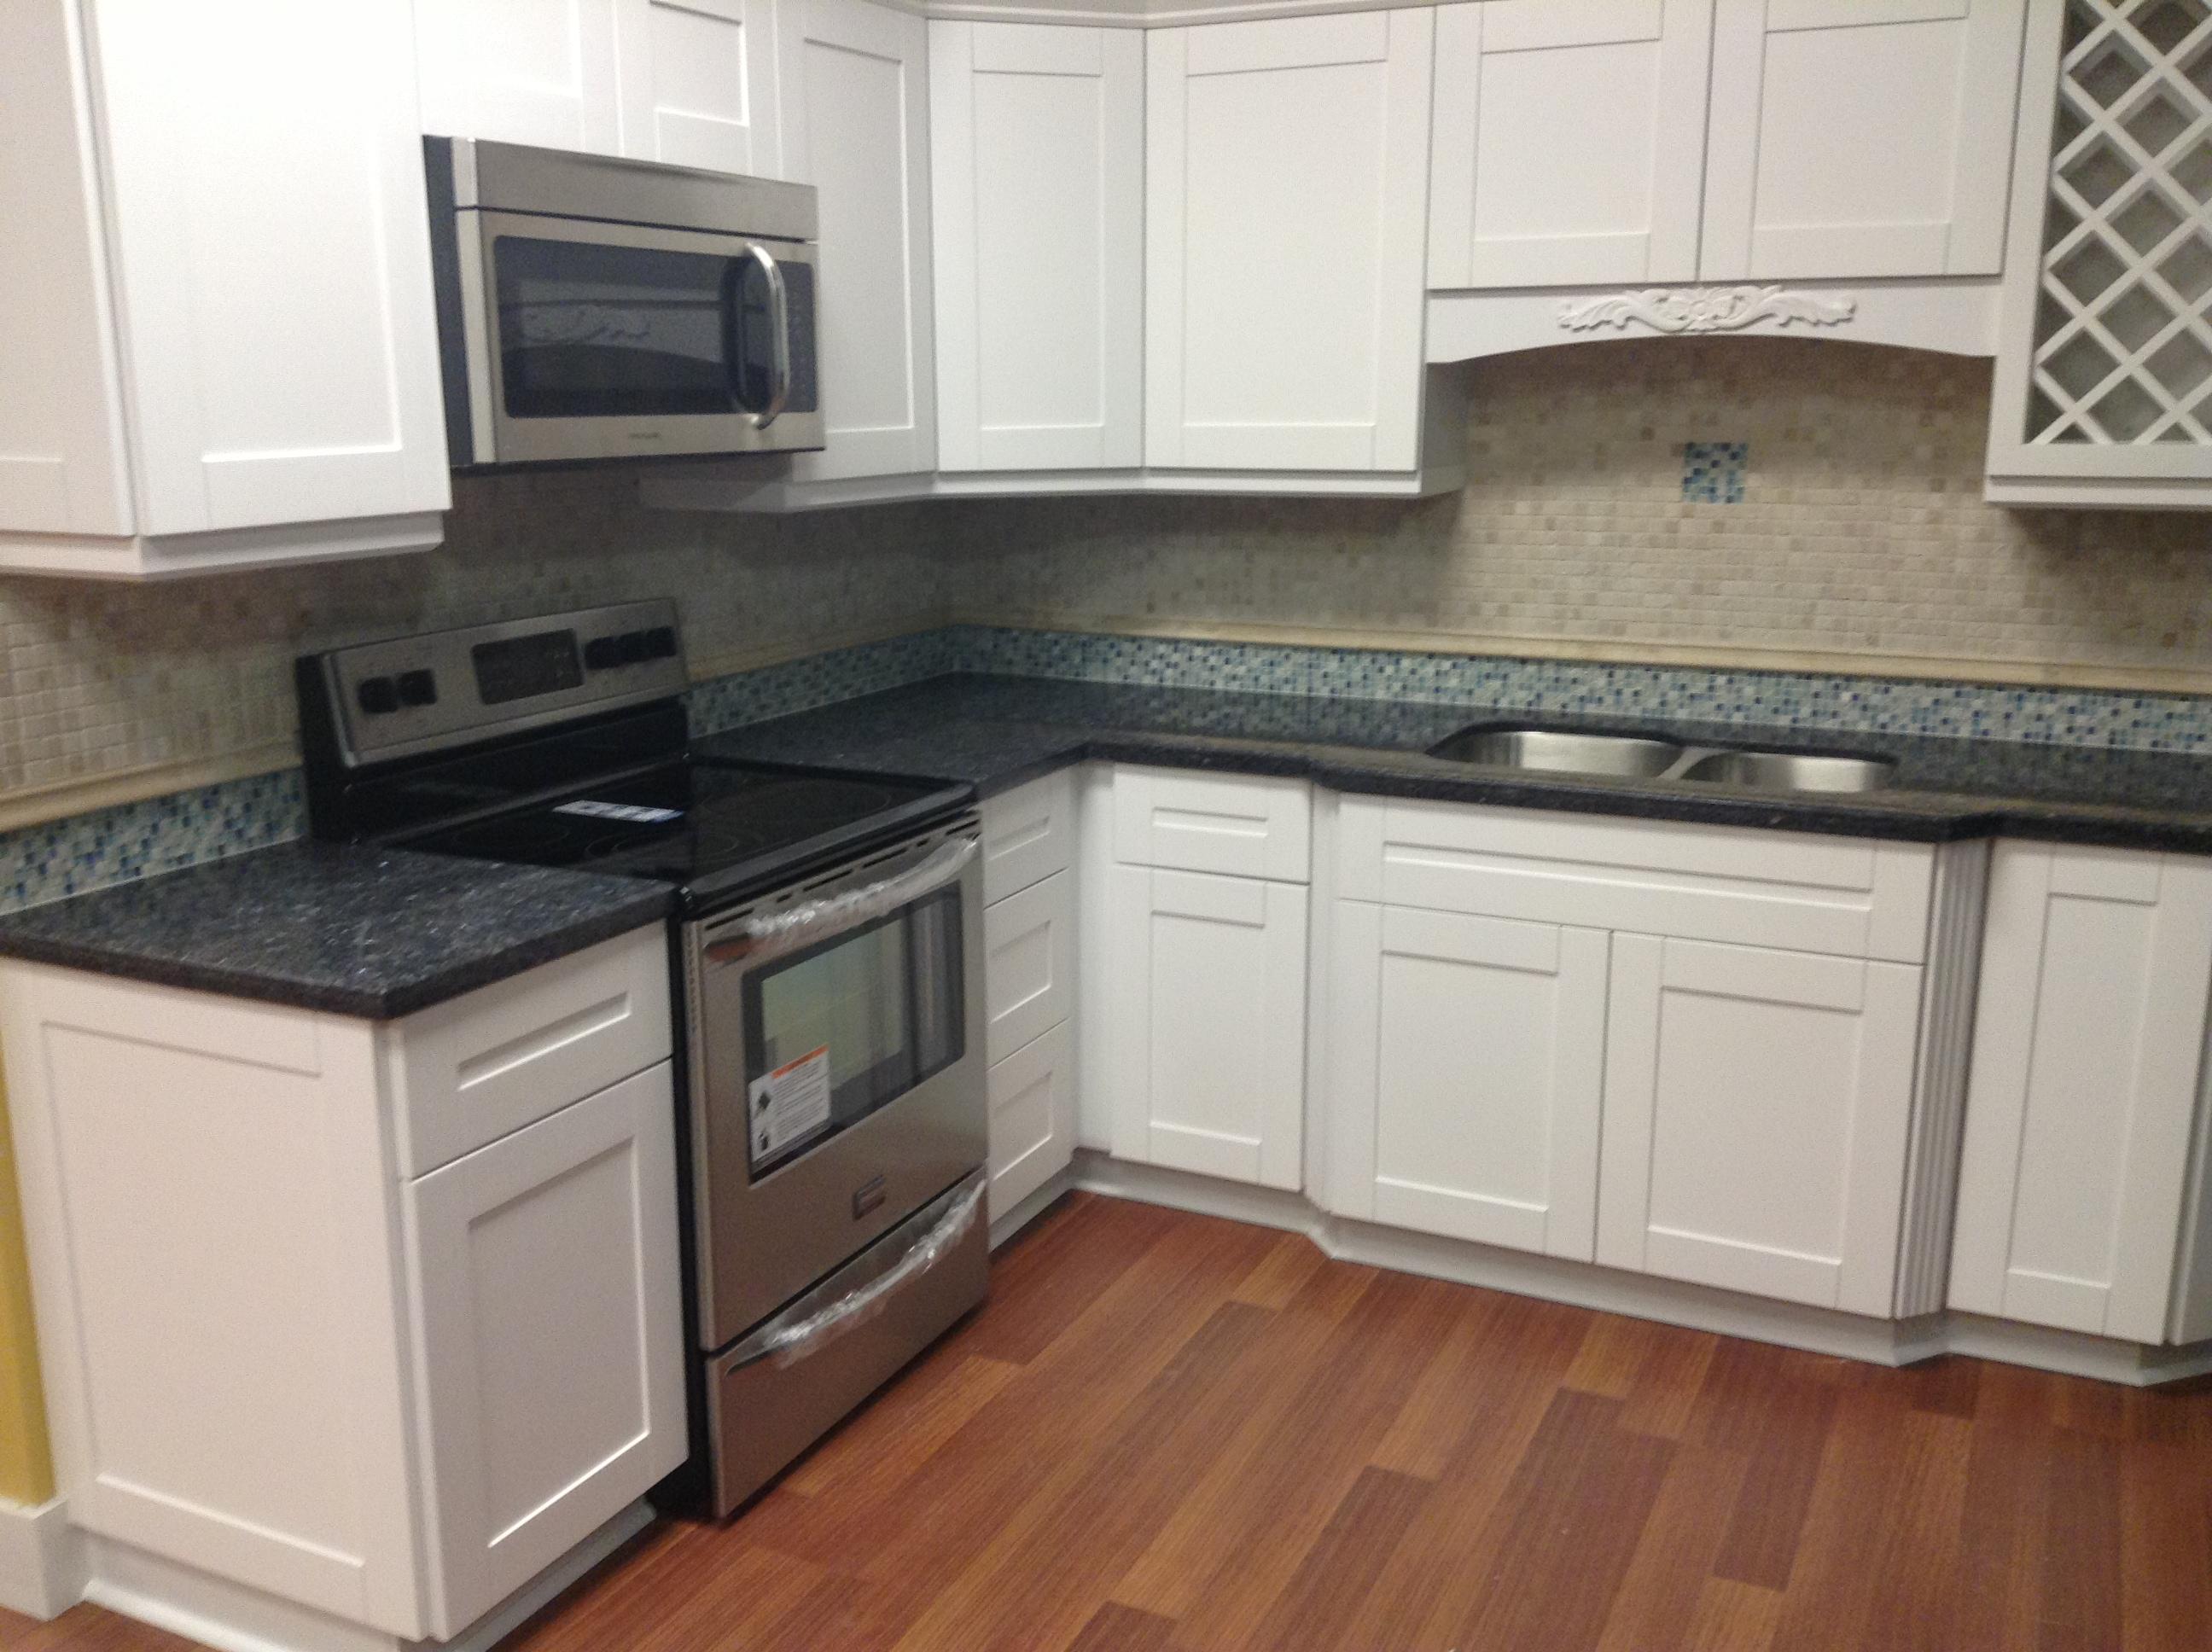 Exceptionnel Best Kitchen Gallery: Wholesale Kitchen Cabi S Pompano Beach Fl Of Kitchen  Cabinets In Pompano